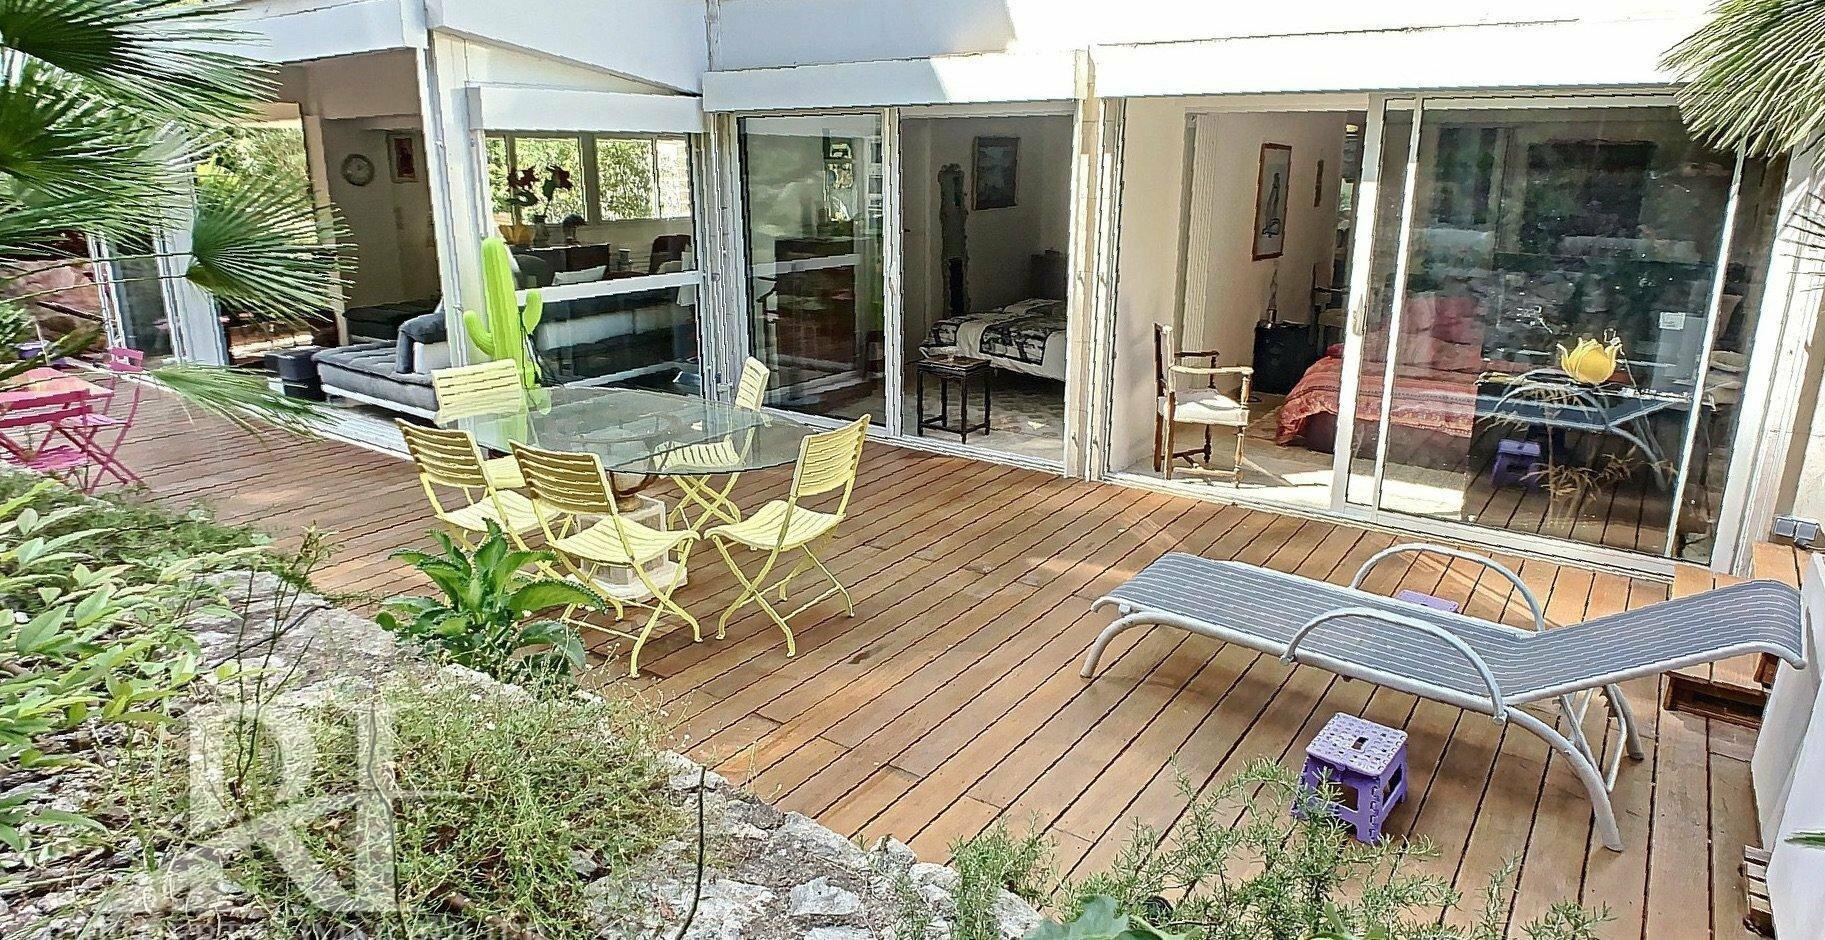 Apartment in Cannes, Provence-Alpes-Côte d'Azur, France 1 - 11085494